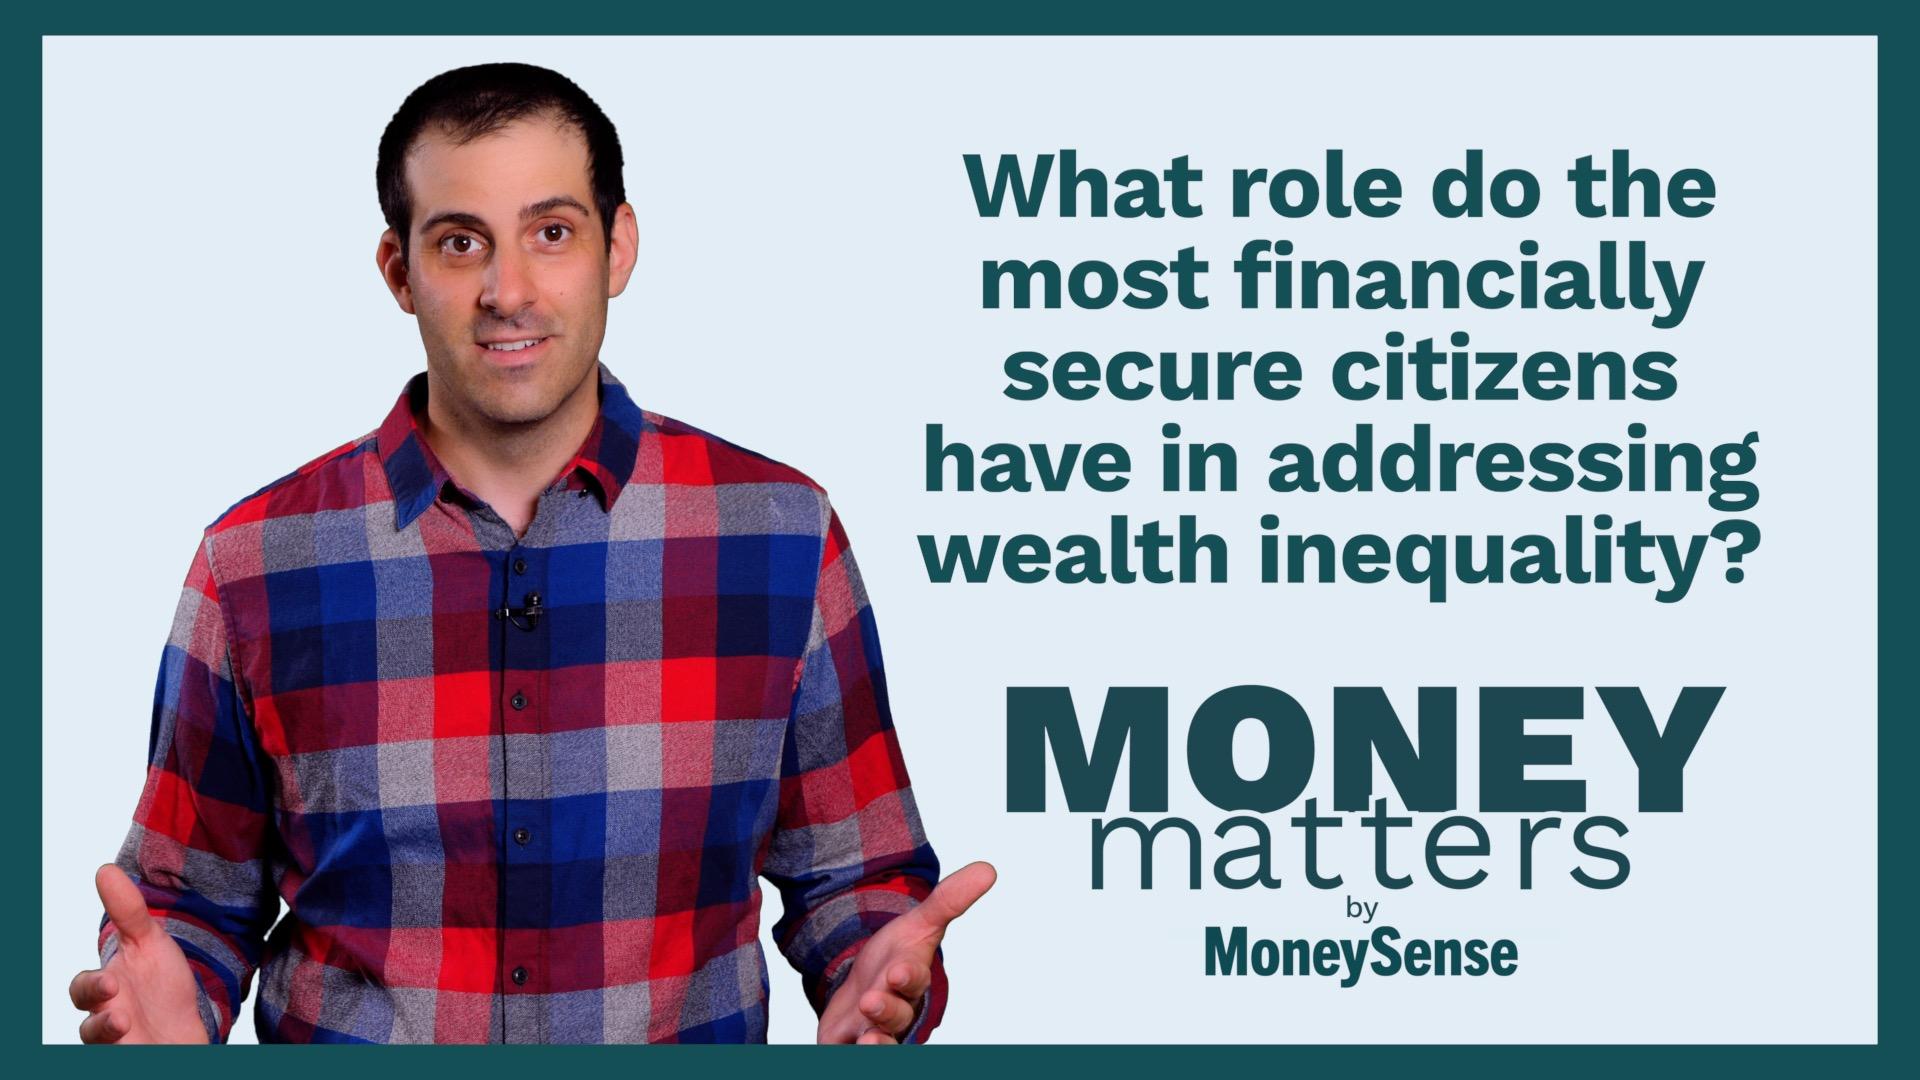 MoneySense general manager Jon Vassallo hosts the Money Matters video series